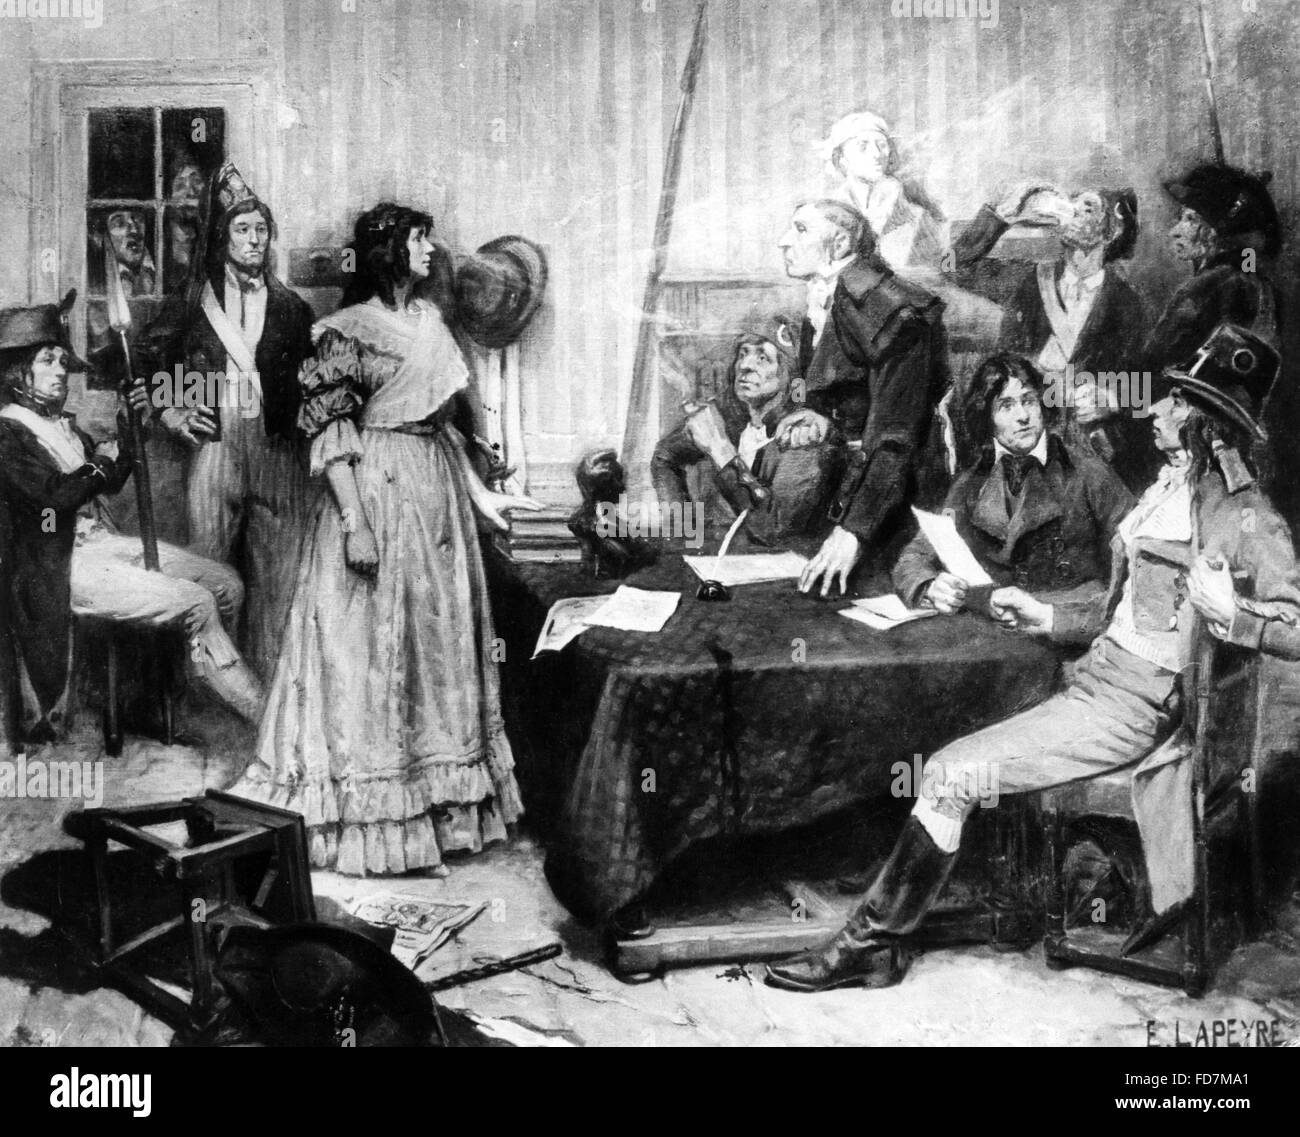 French Revolution: Revolution Tribunal, 1793-1799 - Stock Image